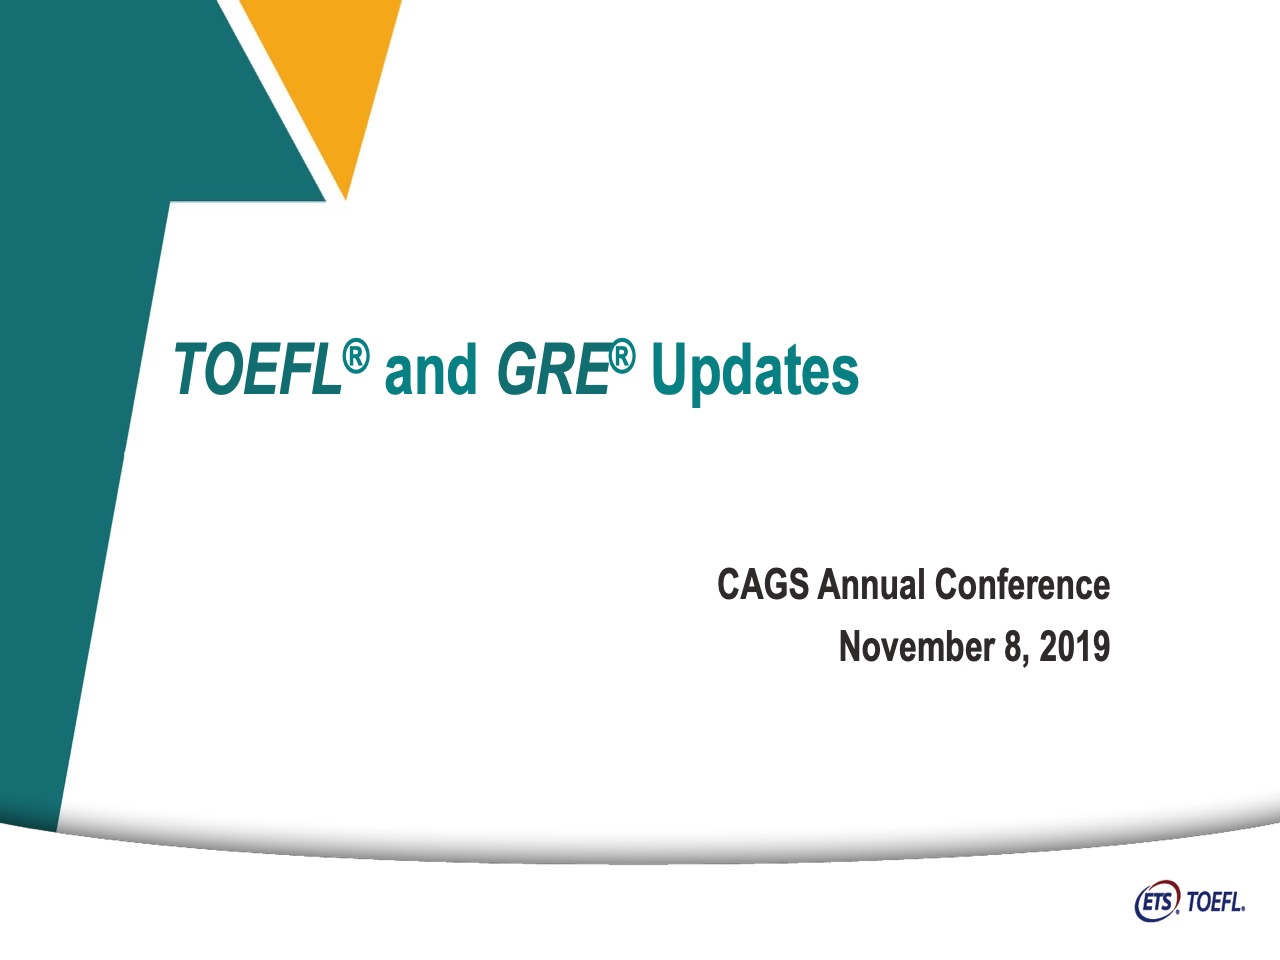 TOEFL® and GRE® Updates